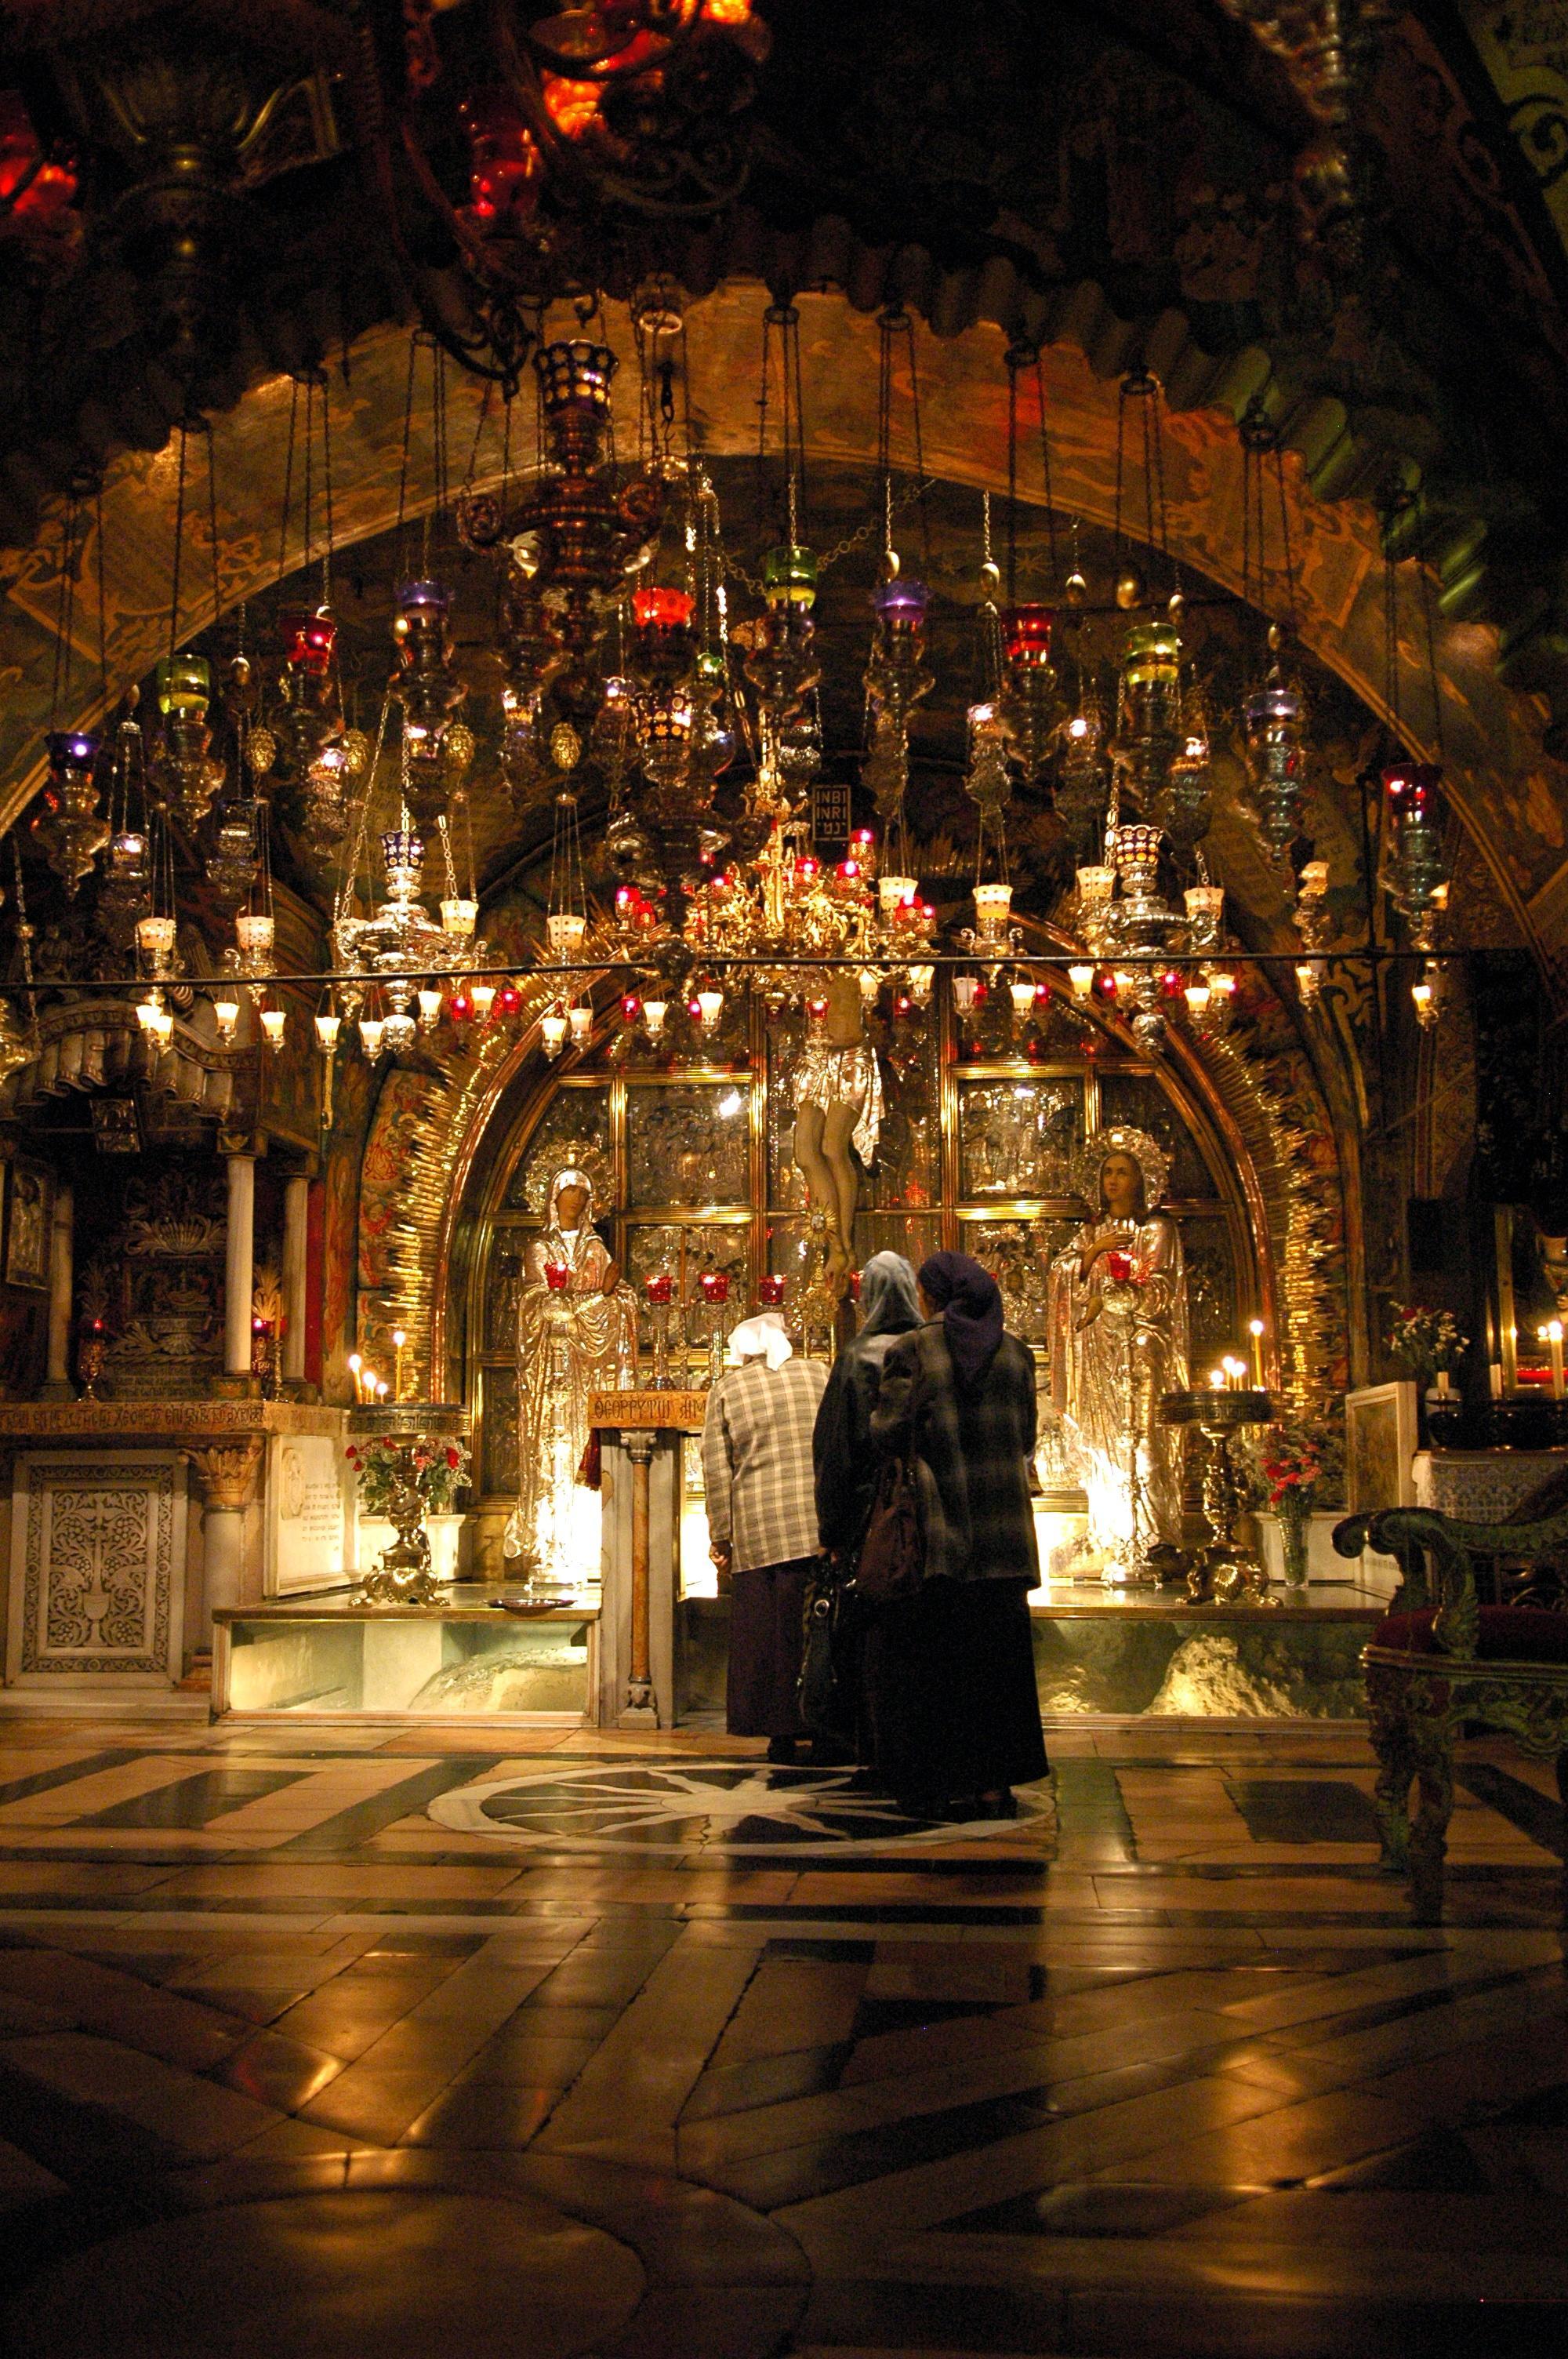 File:Golgotha (Church of the Holy Sepulchre).jpg - Wikipedia